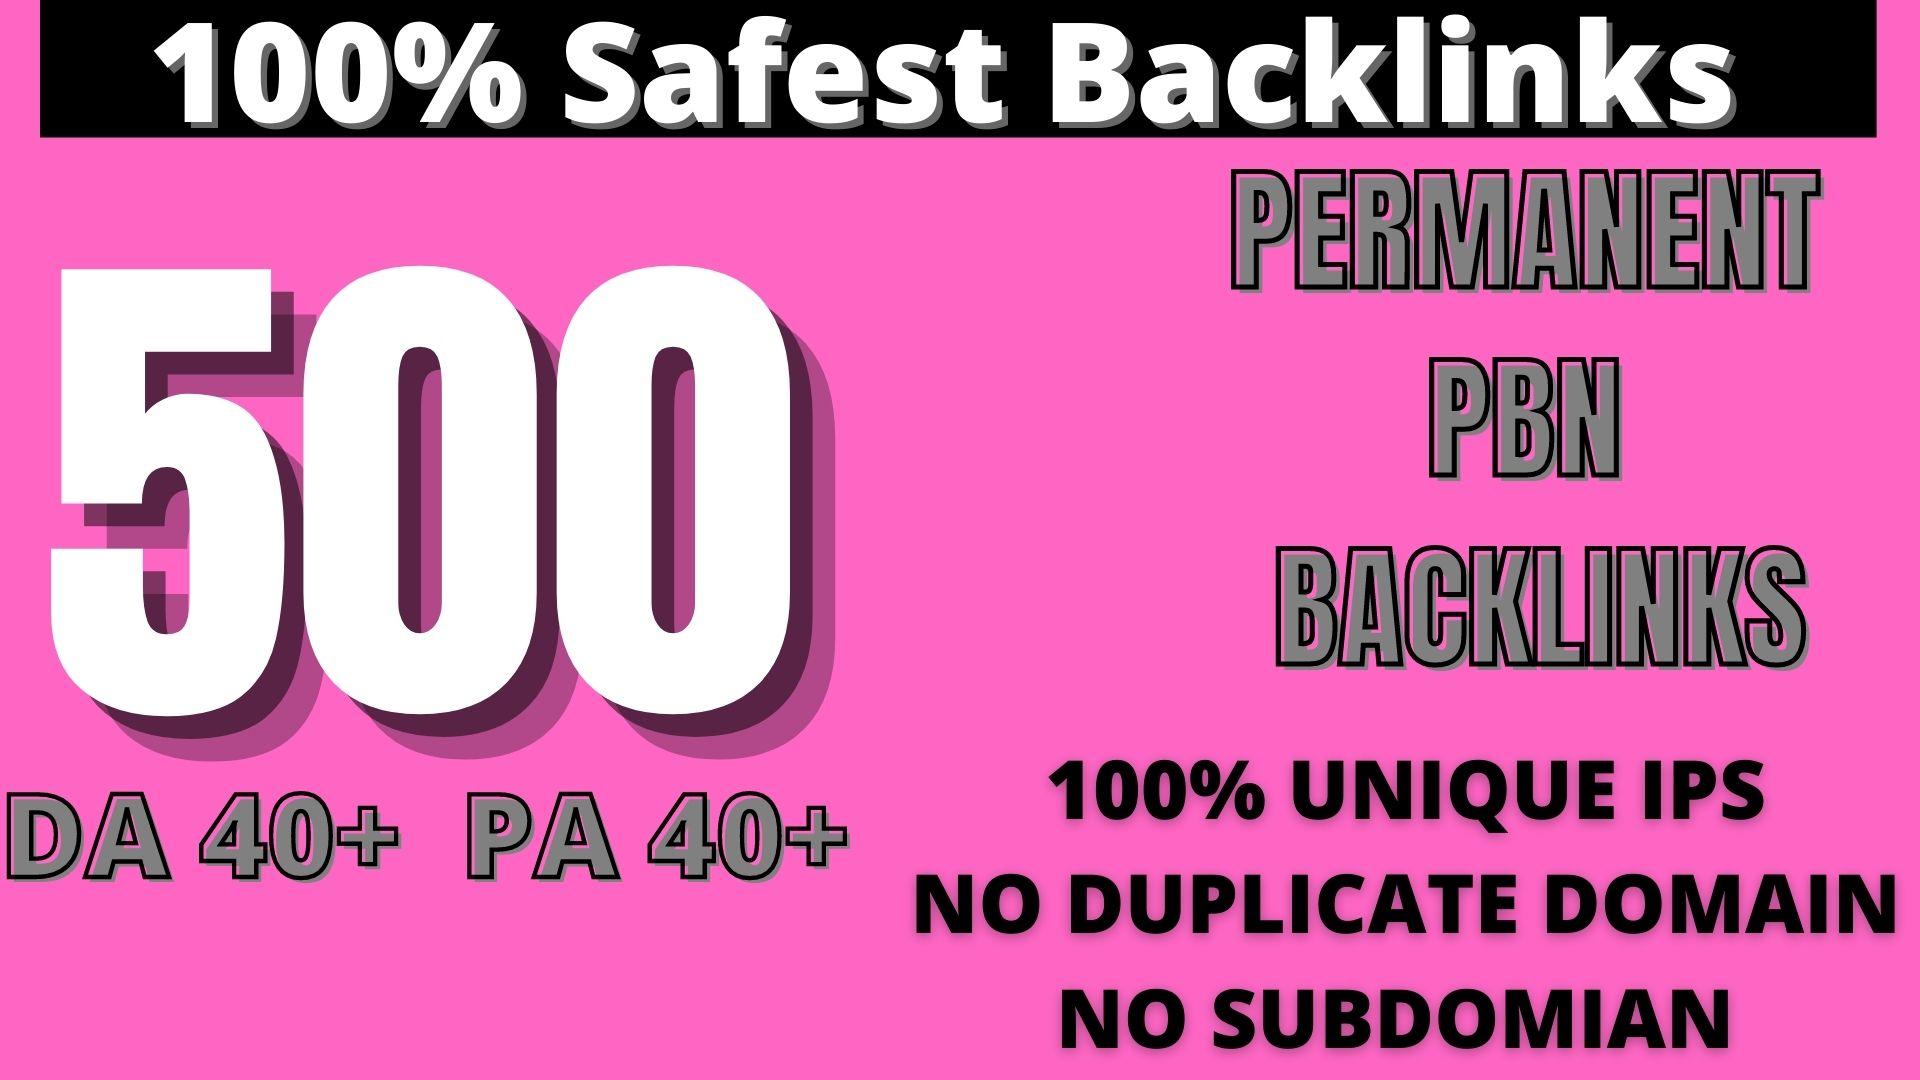 Create 500 HOMEPAGE PBN Backlinks 500 Dofollow & Permanent Links With High DA/PA/CF/TF web2.0